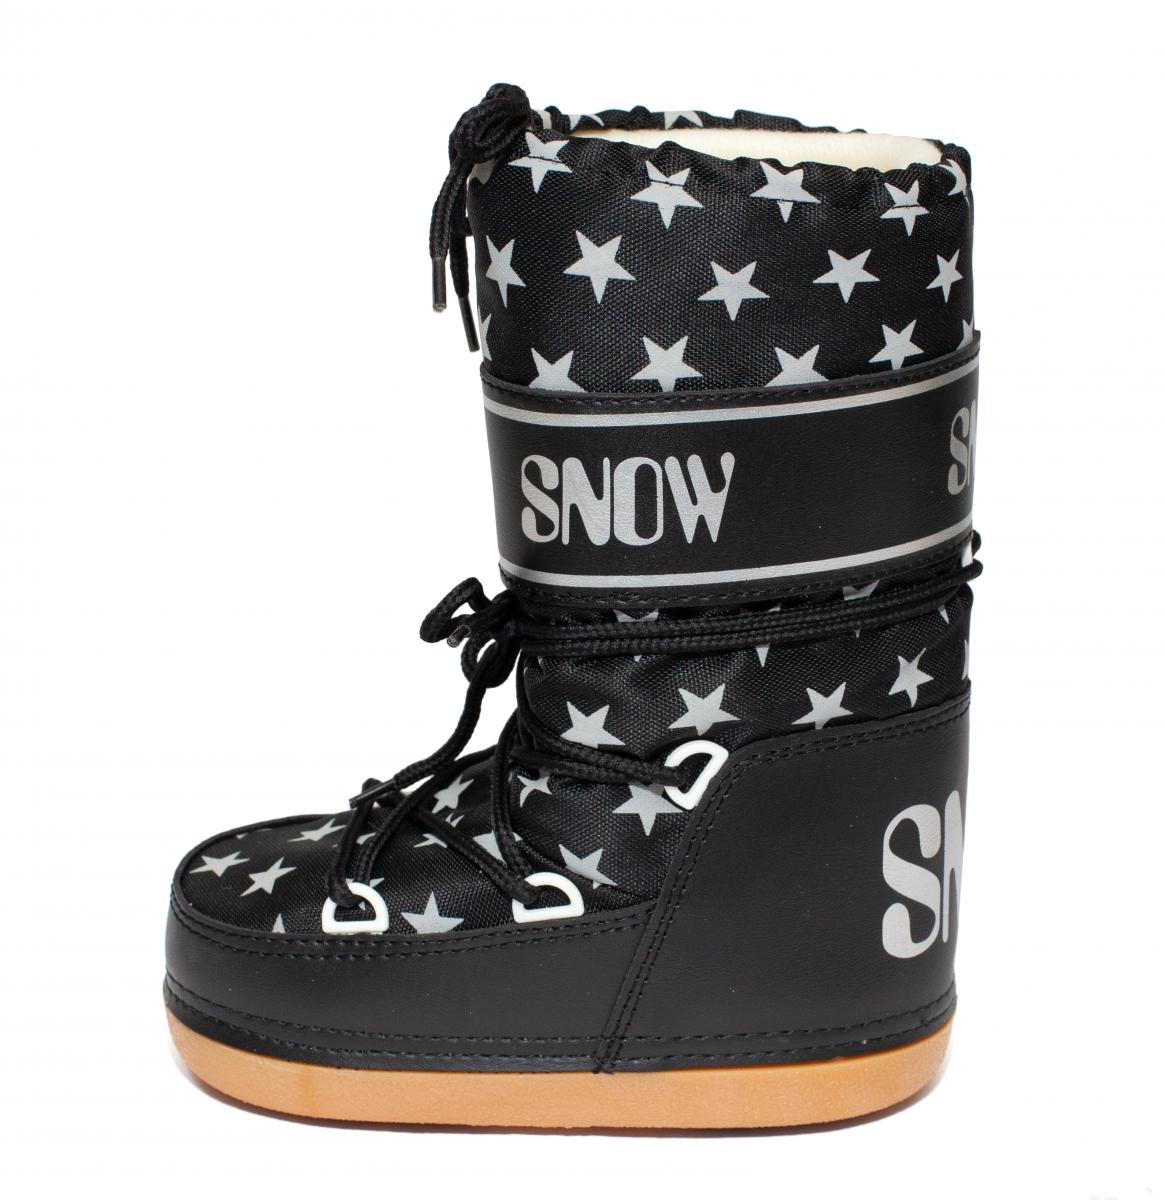 Boots copii de zapada snow 2531 negru stelute 24-36